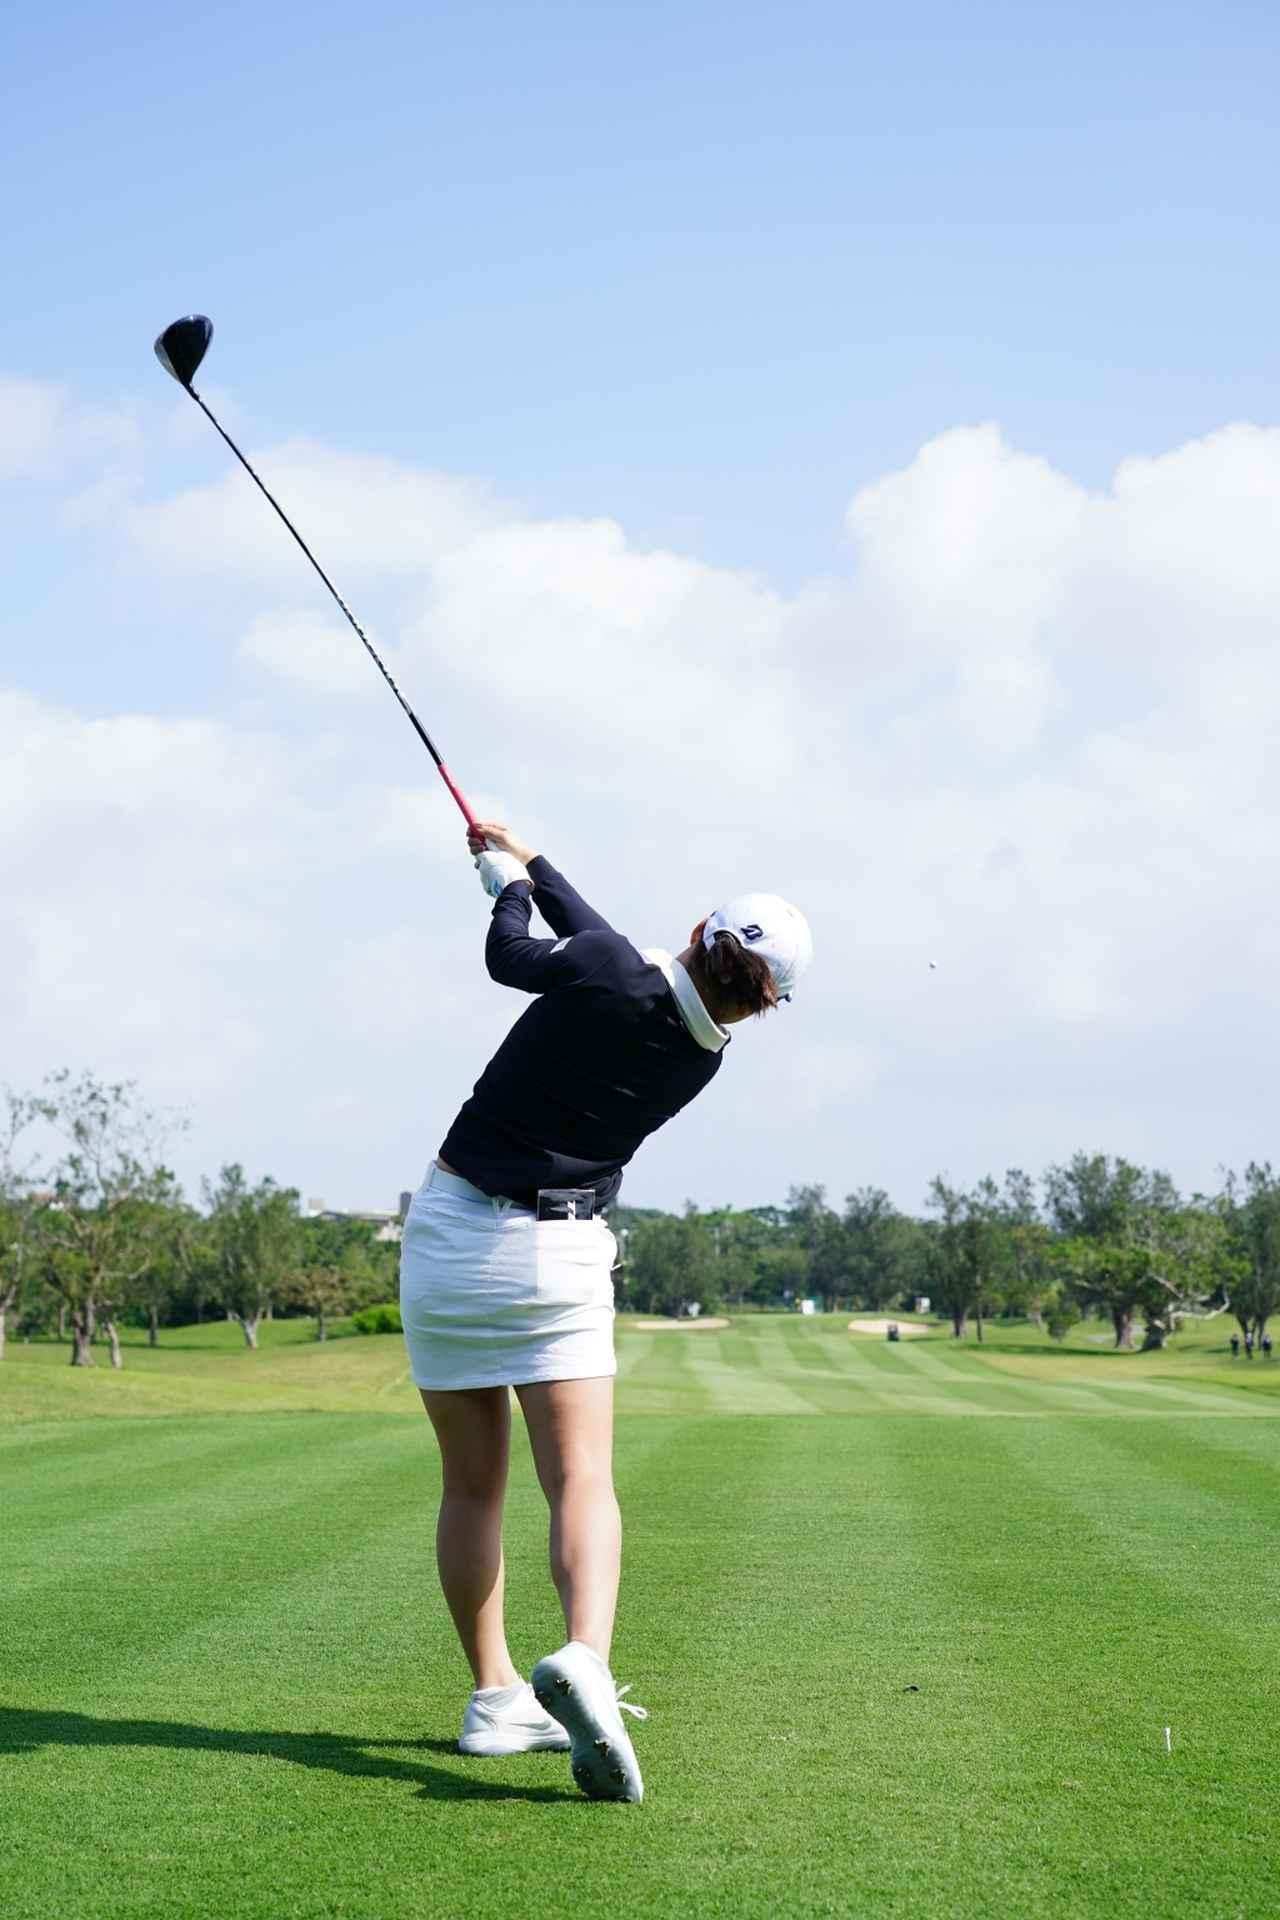 Images : 17番目の画像 - 丹萌乃のドライバー連続写真 - みんなのゴルフダイジェスト